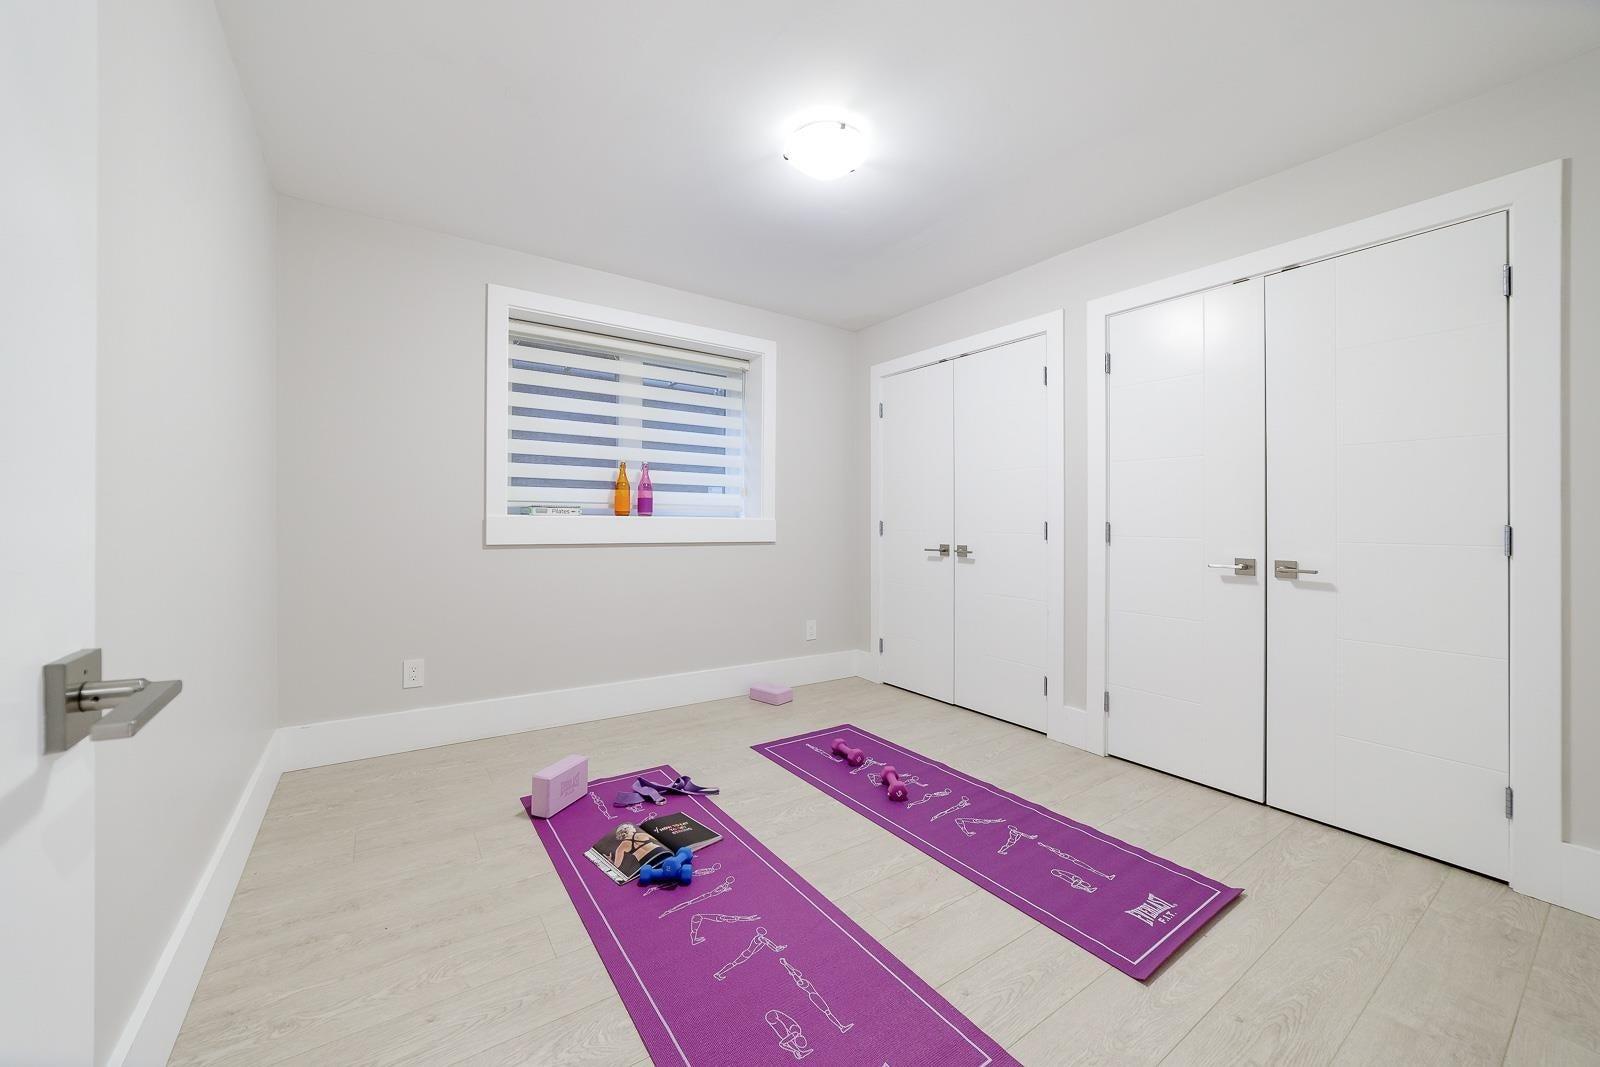 517 GRANADA CRESCENT - Upper Delbrook House/Single Family for sale, 8 Bedrooms (R2615057) - #27